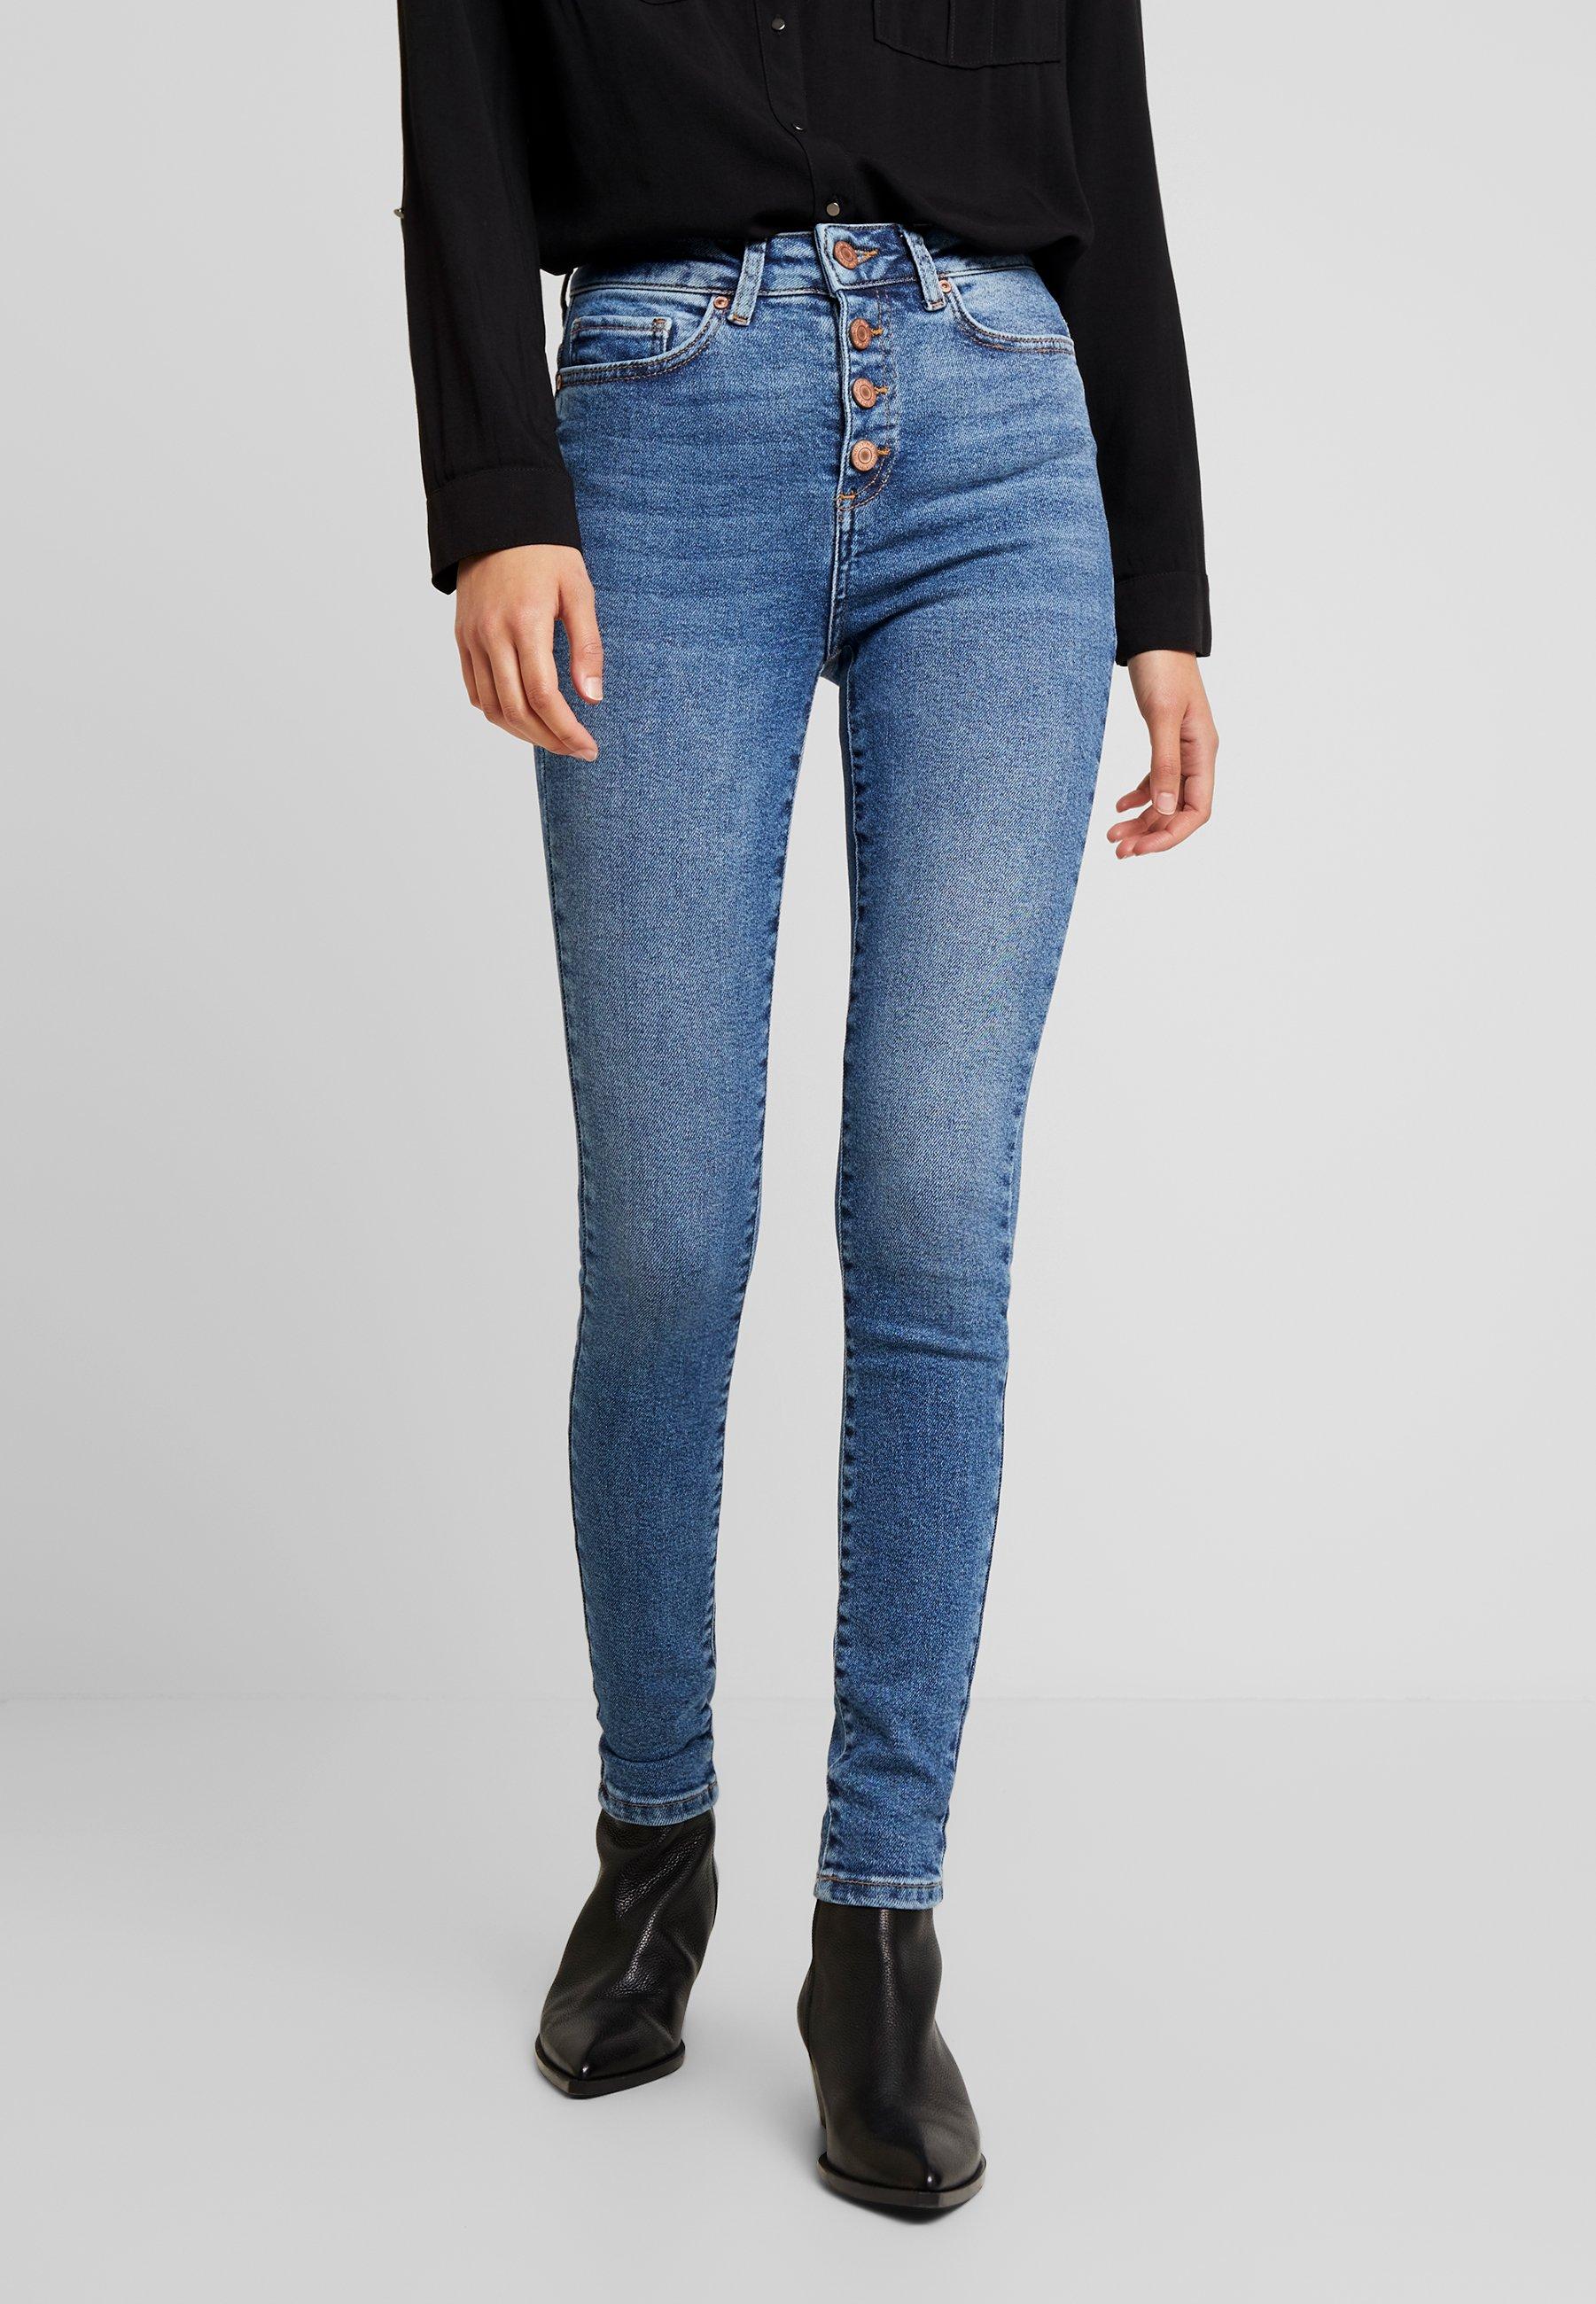 May Blue Nmcallie Skinny Denim Noisy HighwaistJeans Medium WYD2EH9I